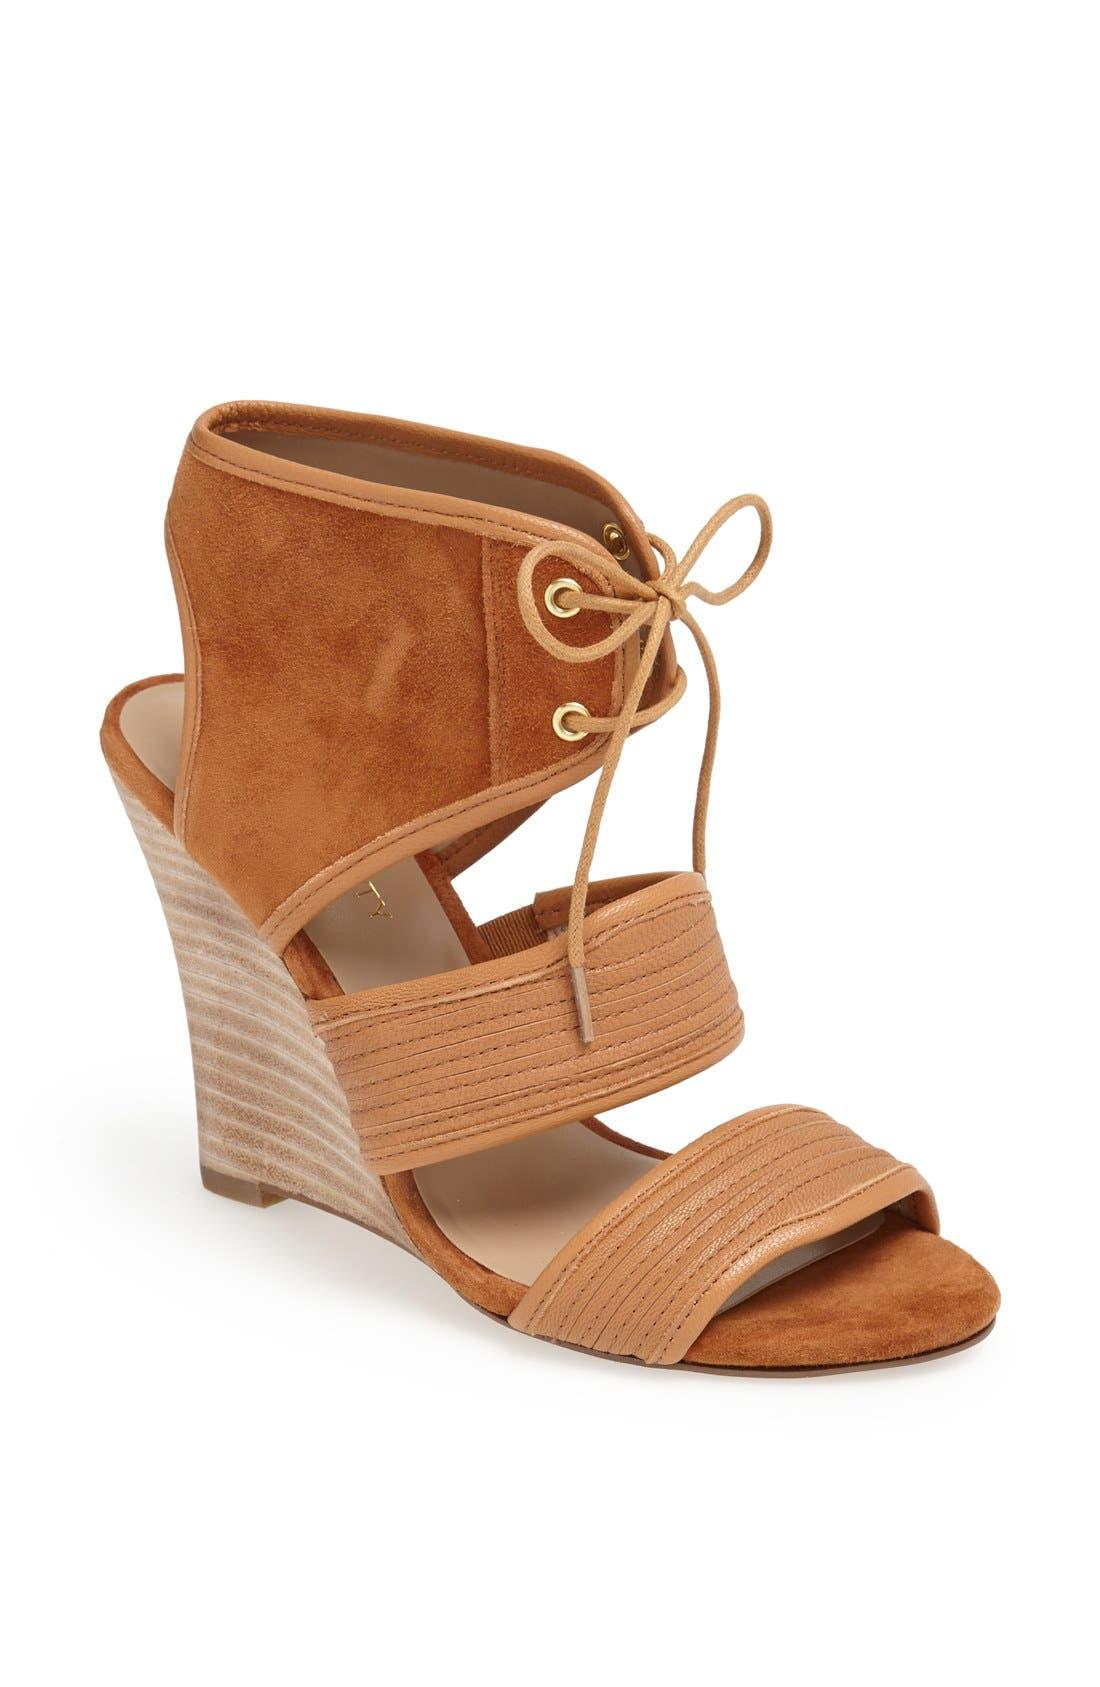 Main Image - Sole Society 'Khalessi' Sandal